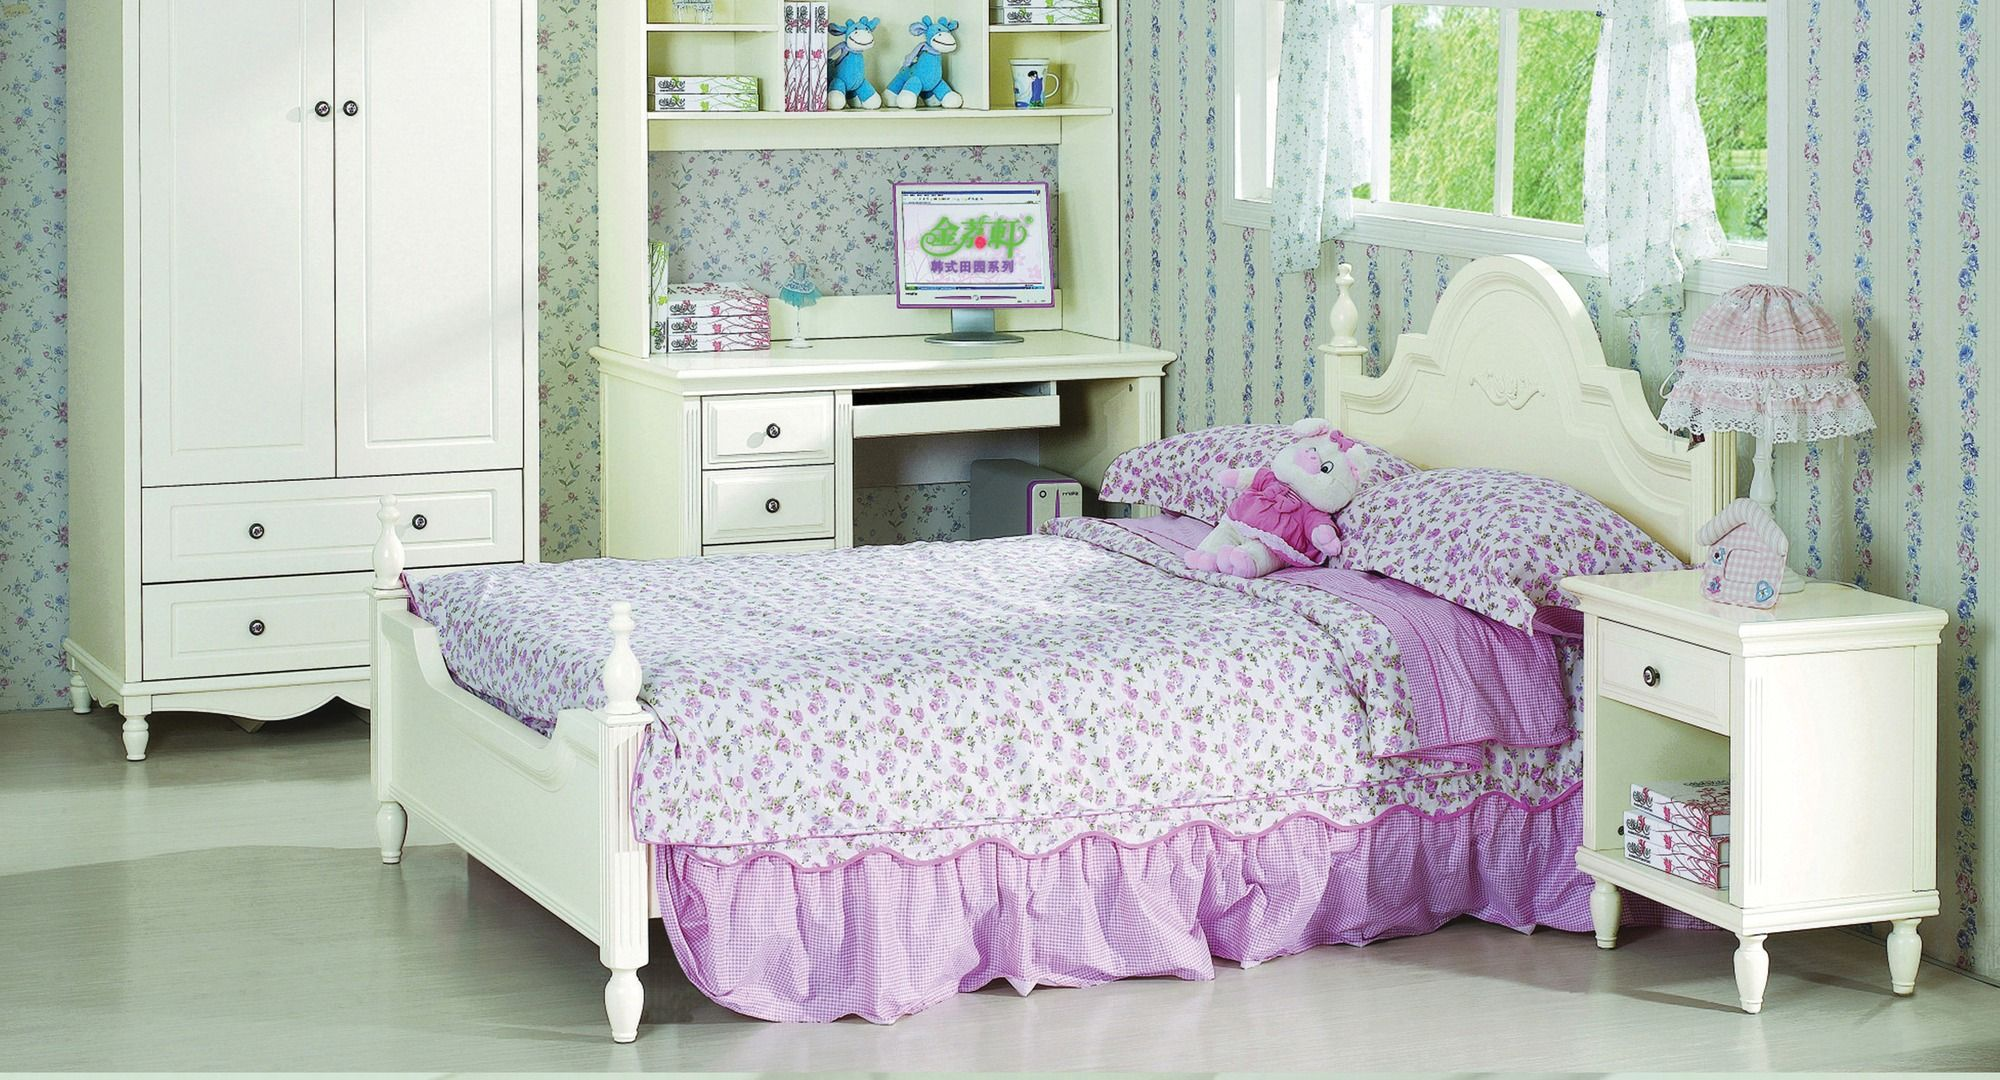 White Lotus French Style King Single Bed Bay Street King